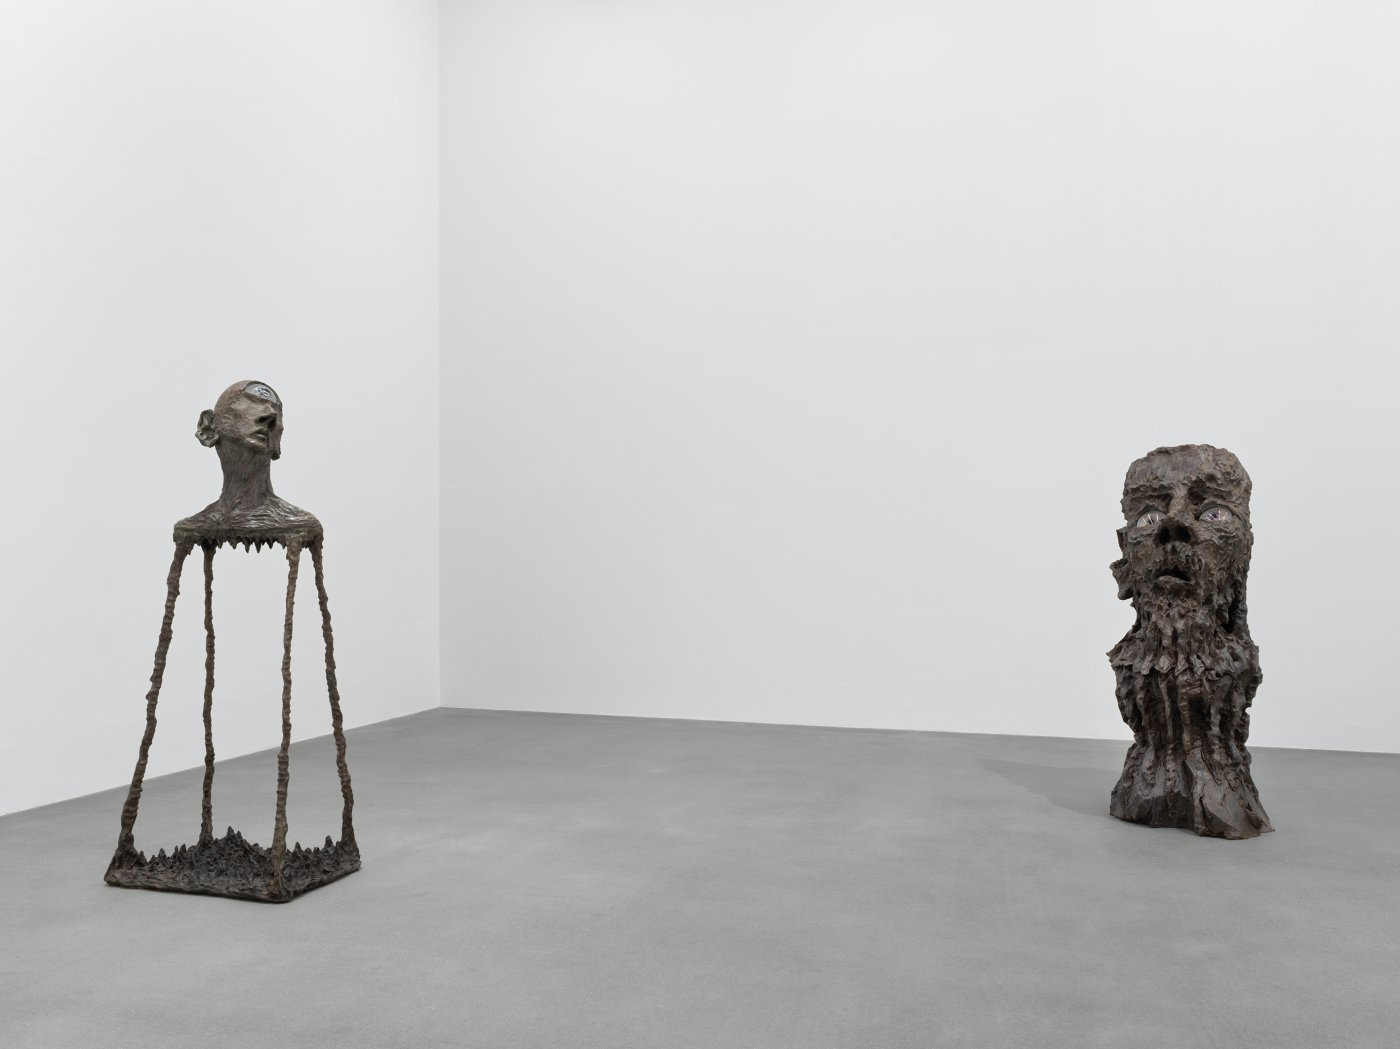 Galerie Eva Presenhuber Waldmanstrasse Jean-Marie Appriou 4